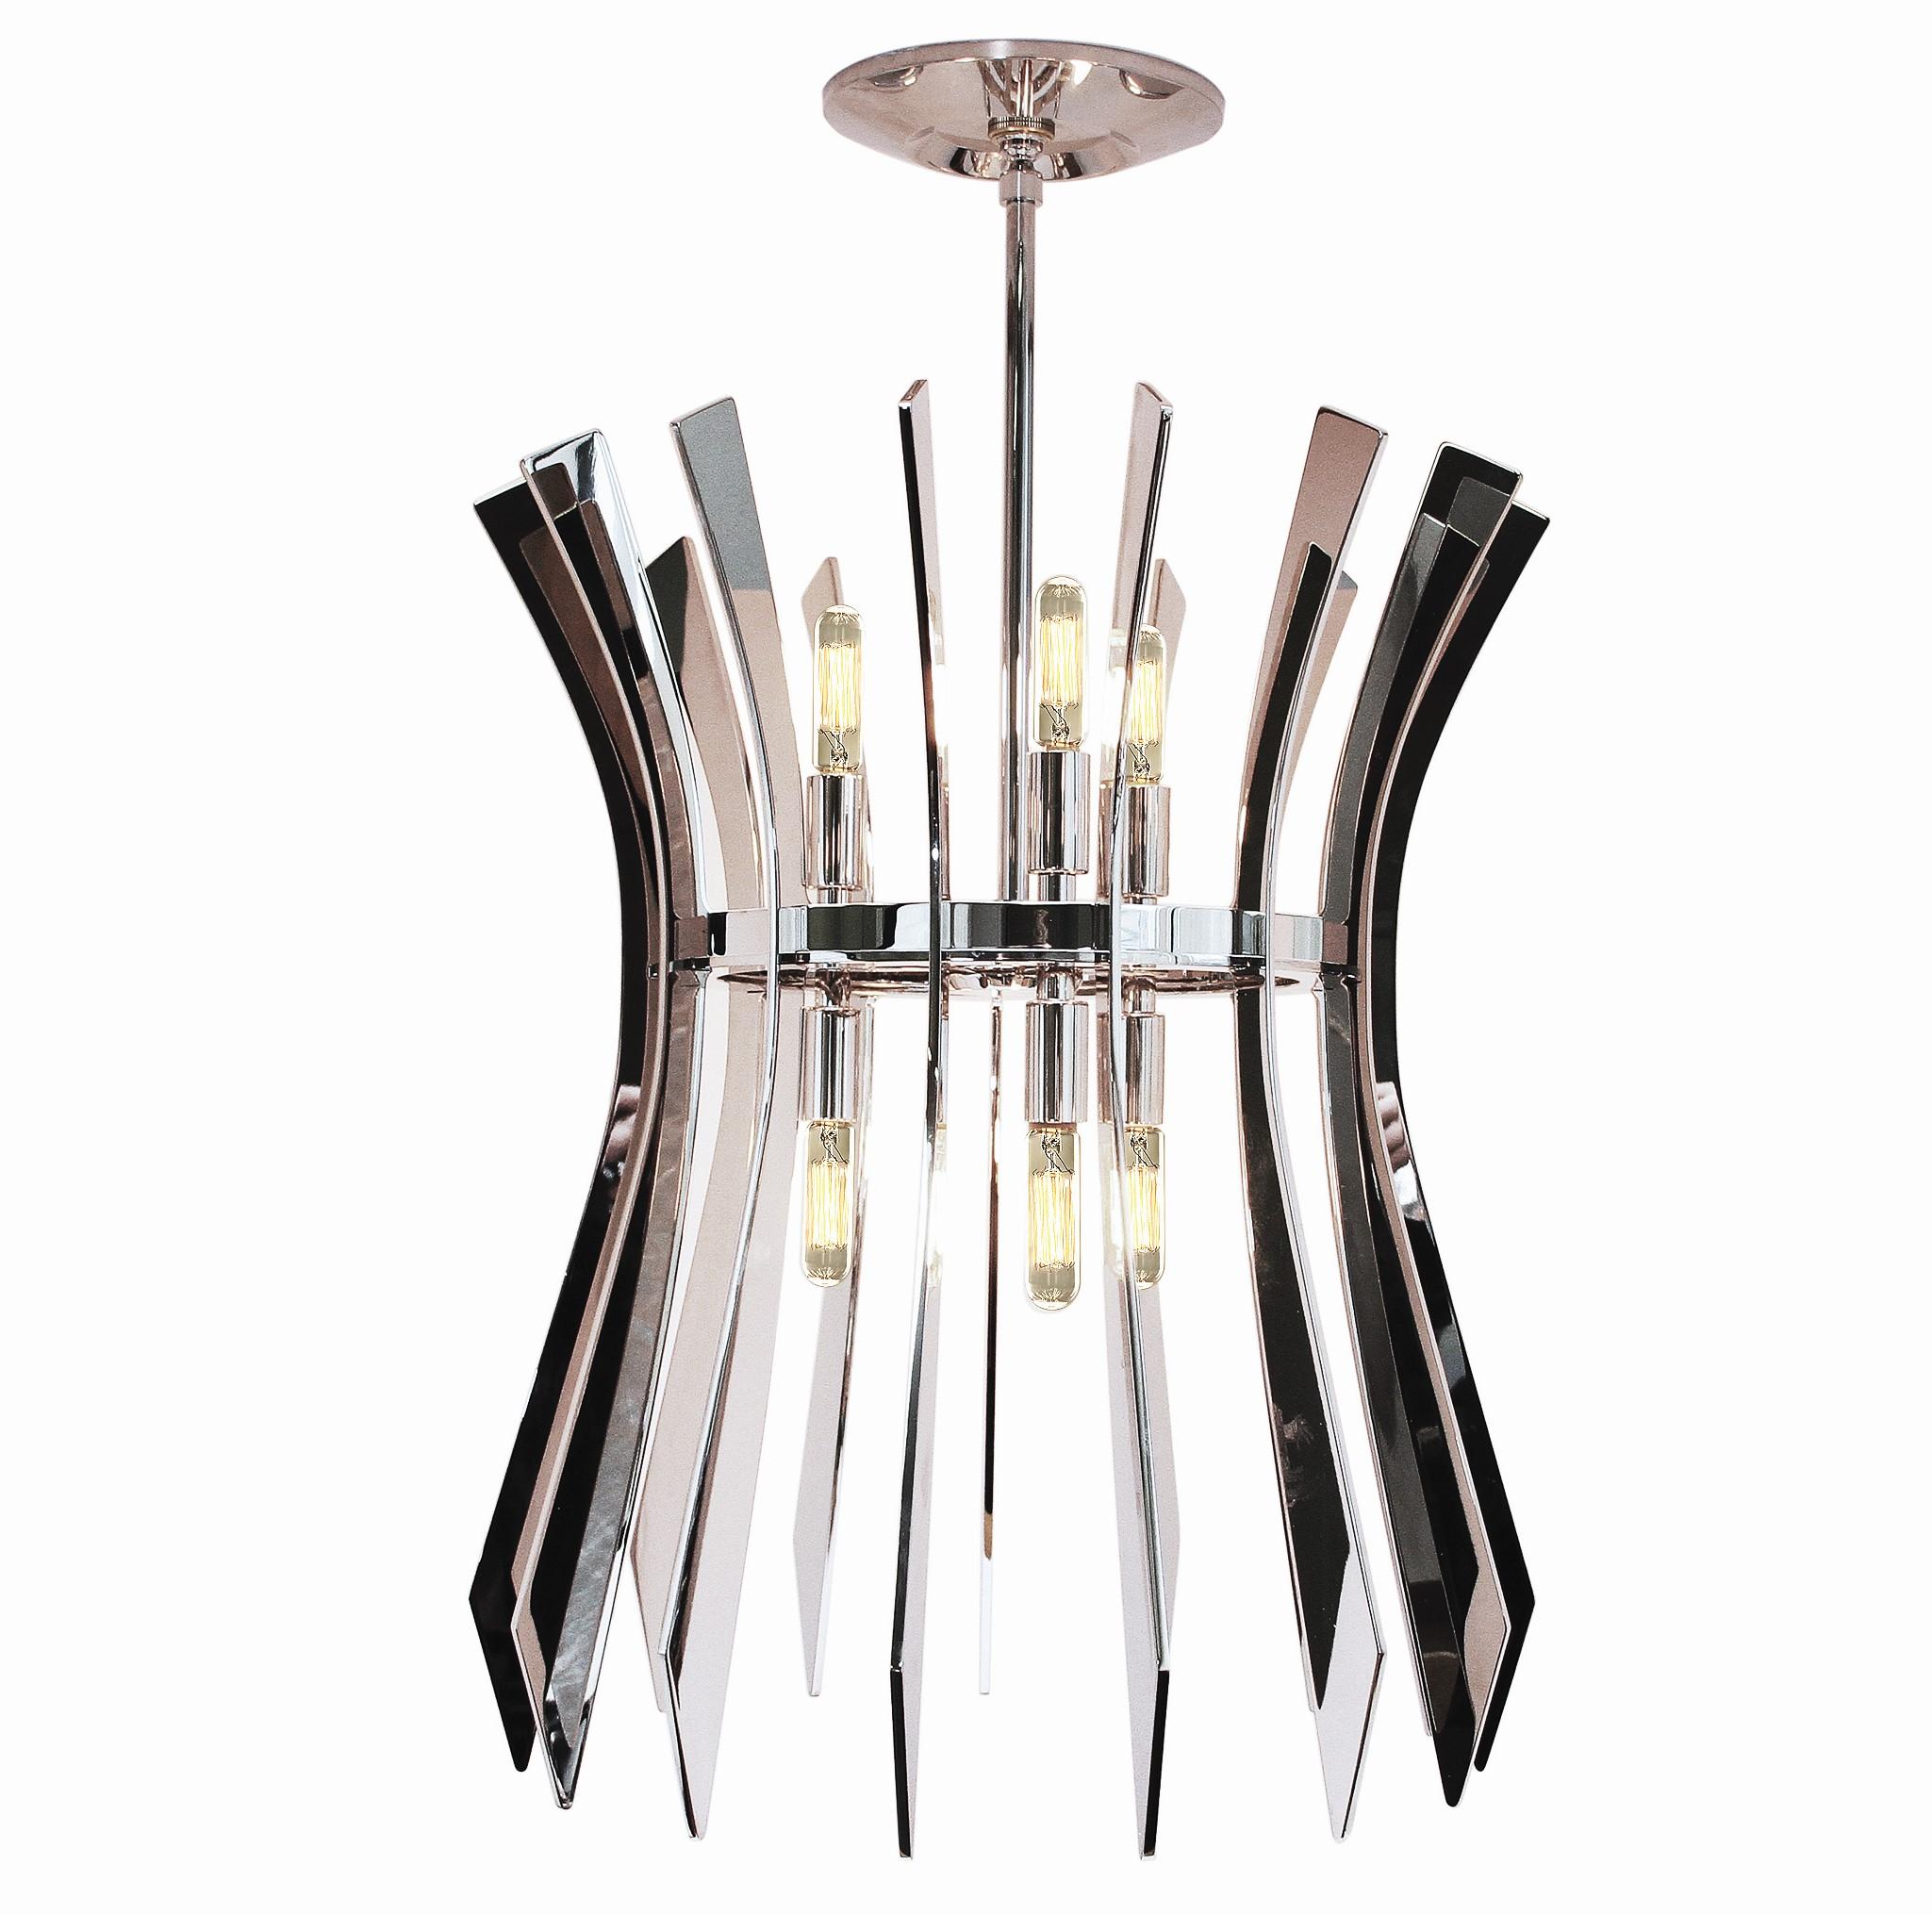 SA Baxter - Blades Ceiling Light